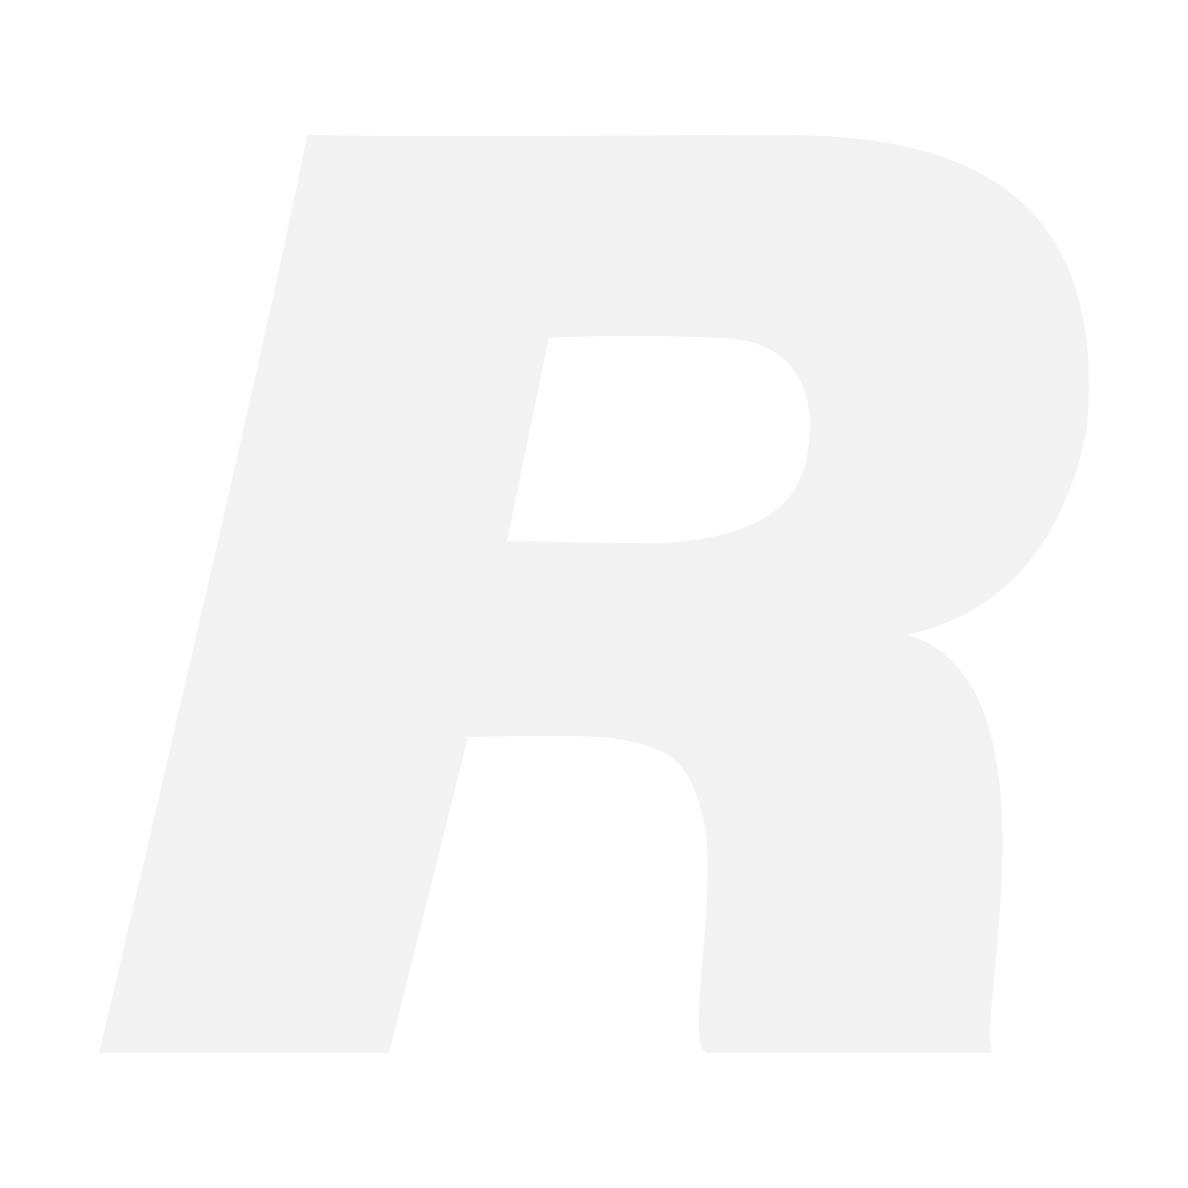 OLYMPUS OM-D E-M5+akkukahva KÄYTETTY